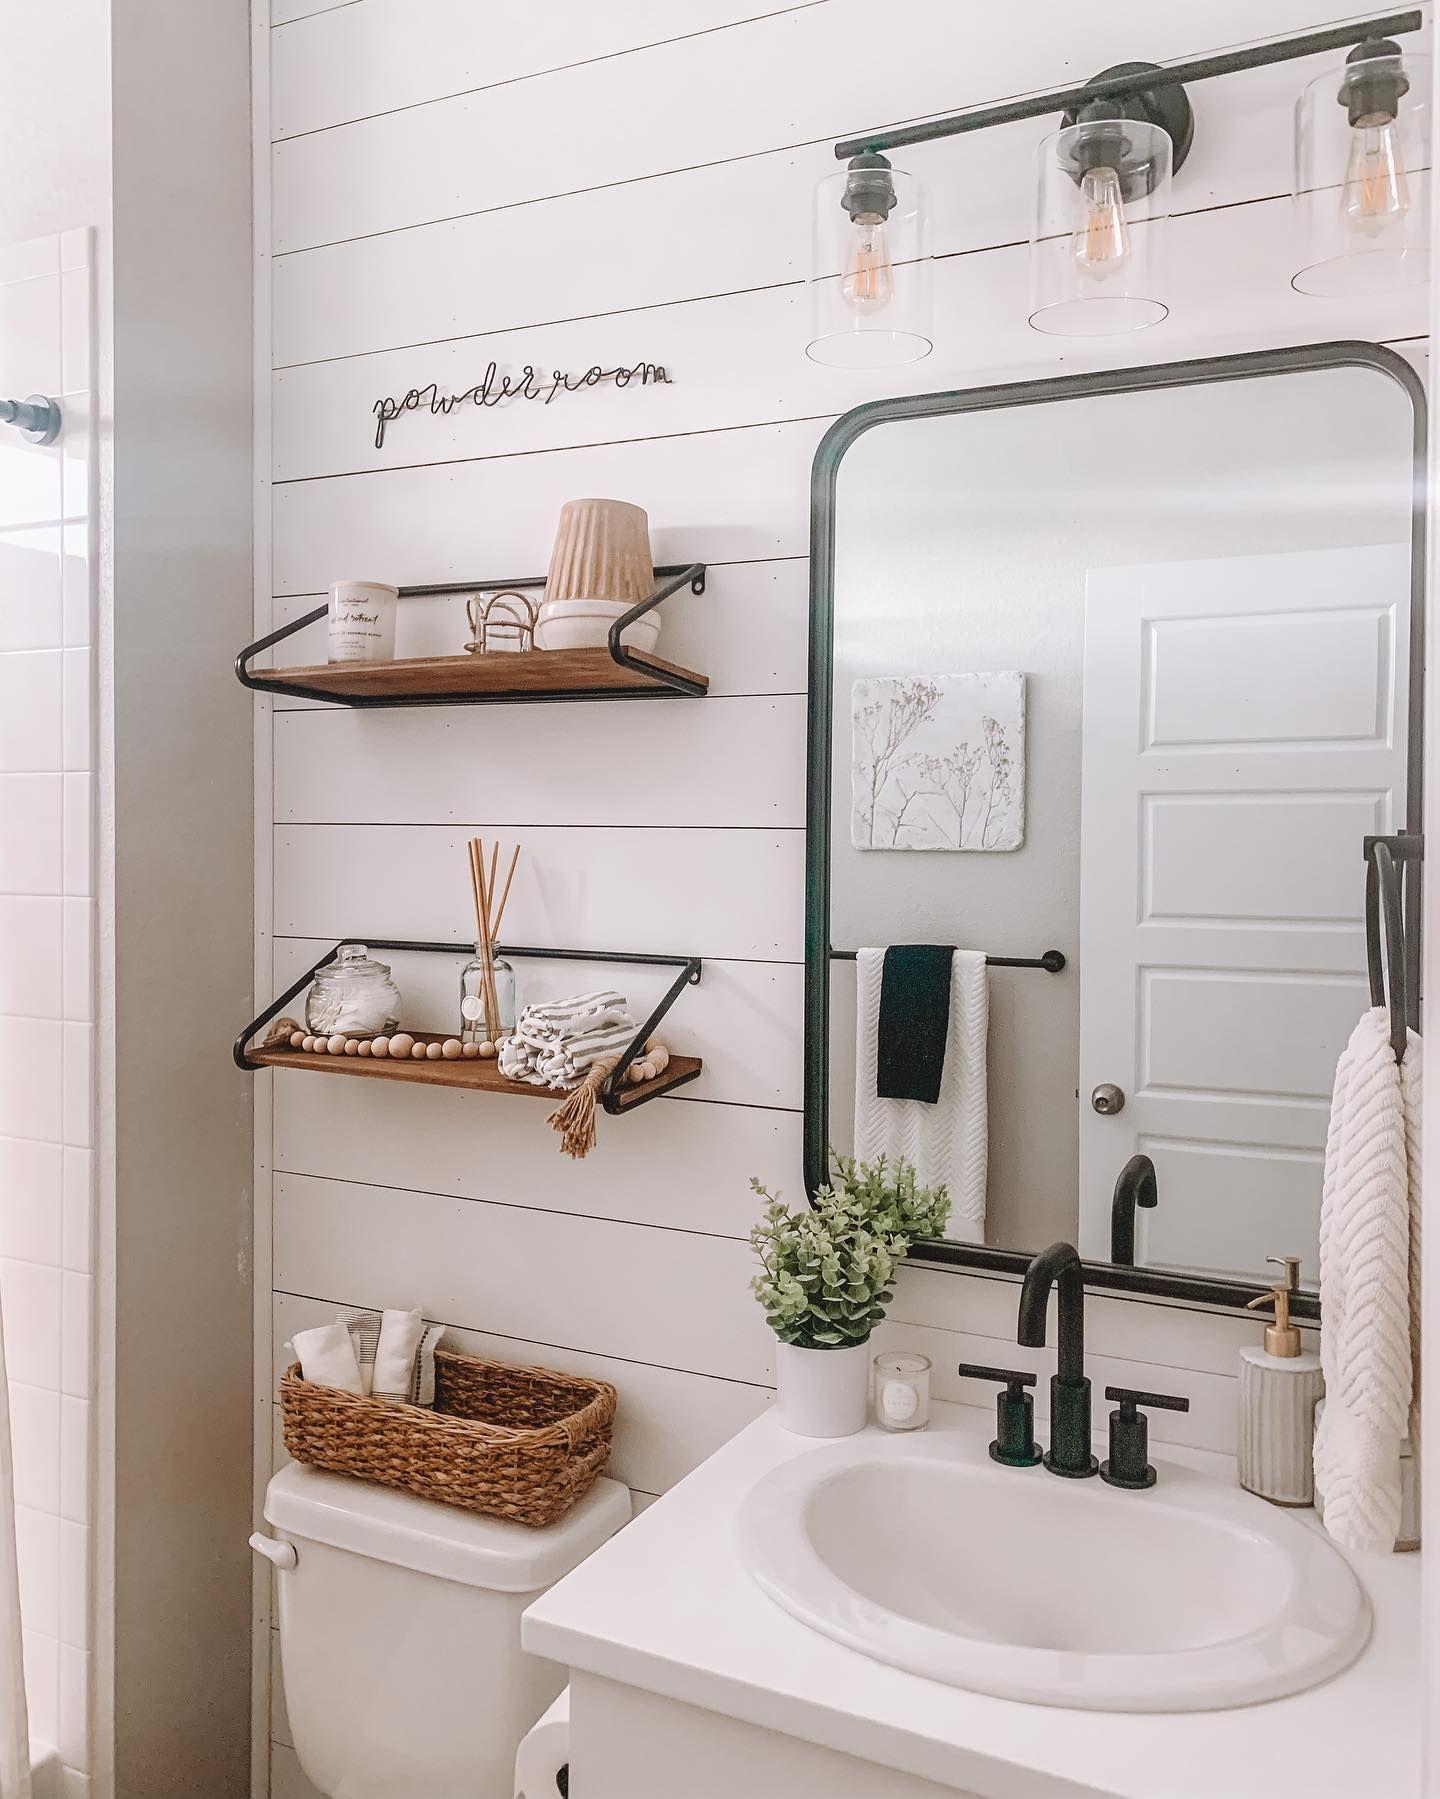 Targetstyle Athomewiththeleachs In 2021 Shiplap Bathroom Wall Simple Bathroom Decor Bathroom Accent Wall